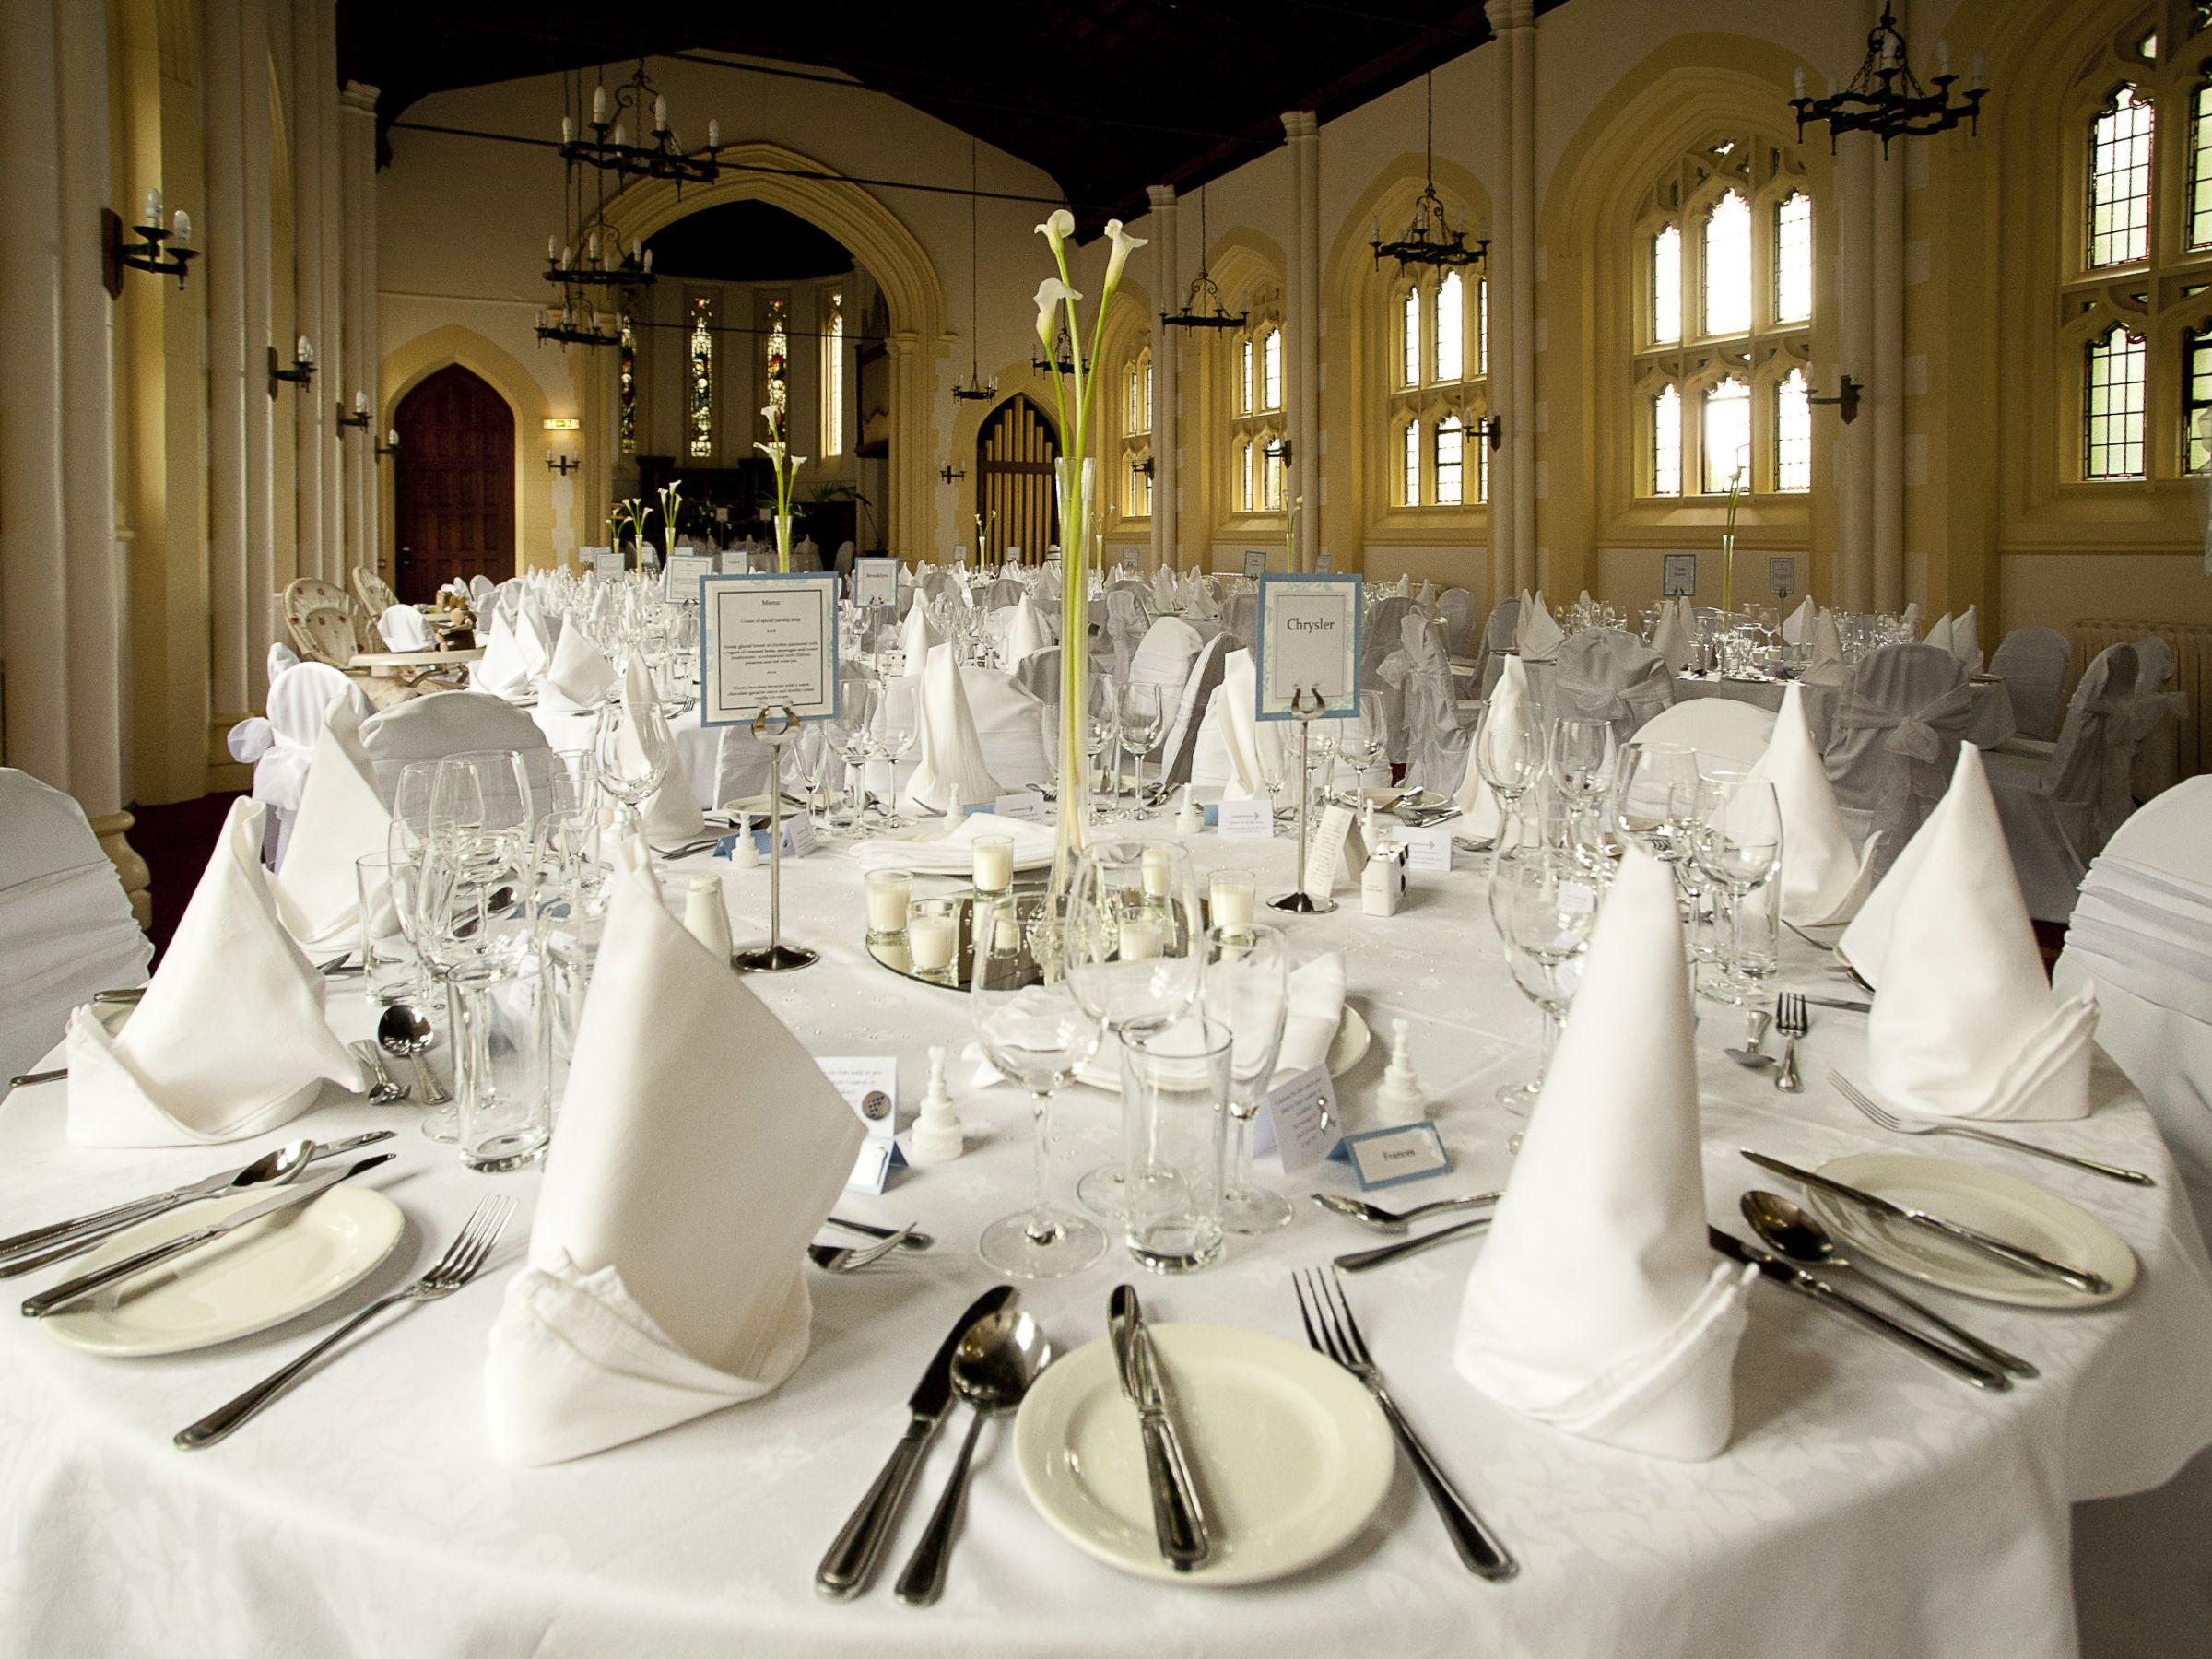 The Joachim Room At College Of St Hild Bede Durham UniversityThe CollegeWedding VenuesWedding Reception